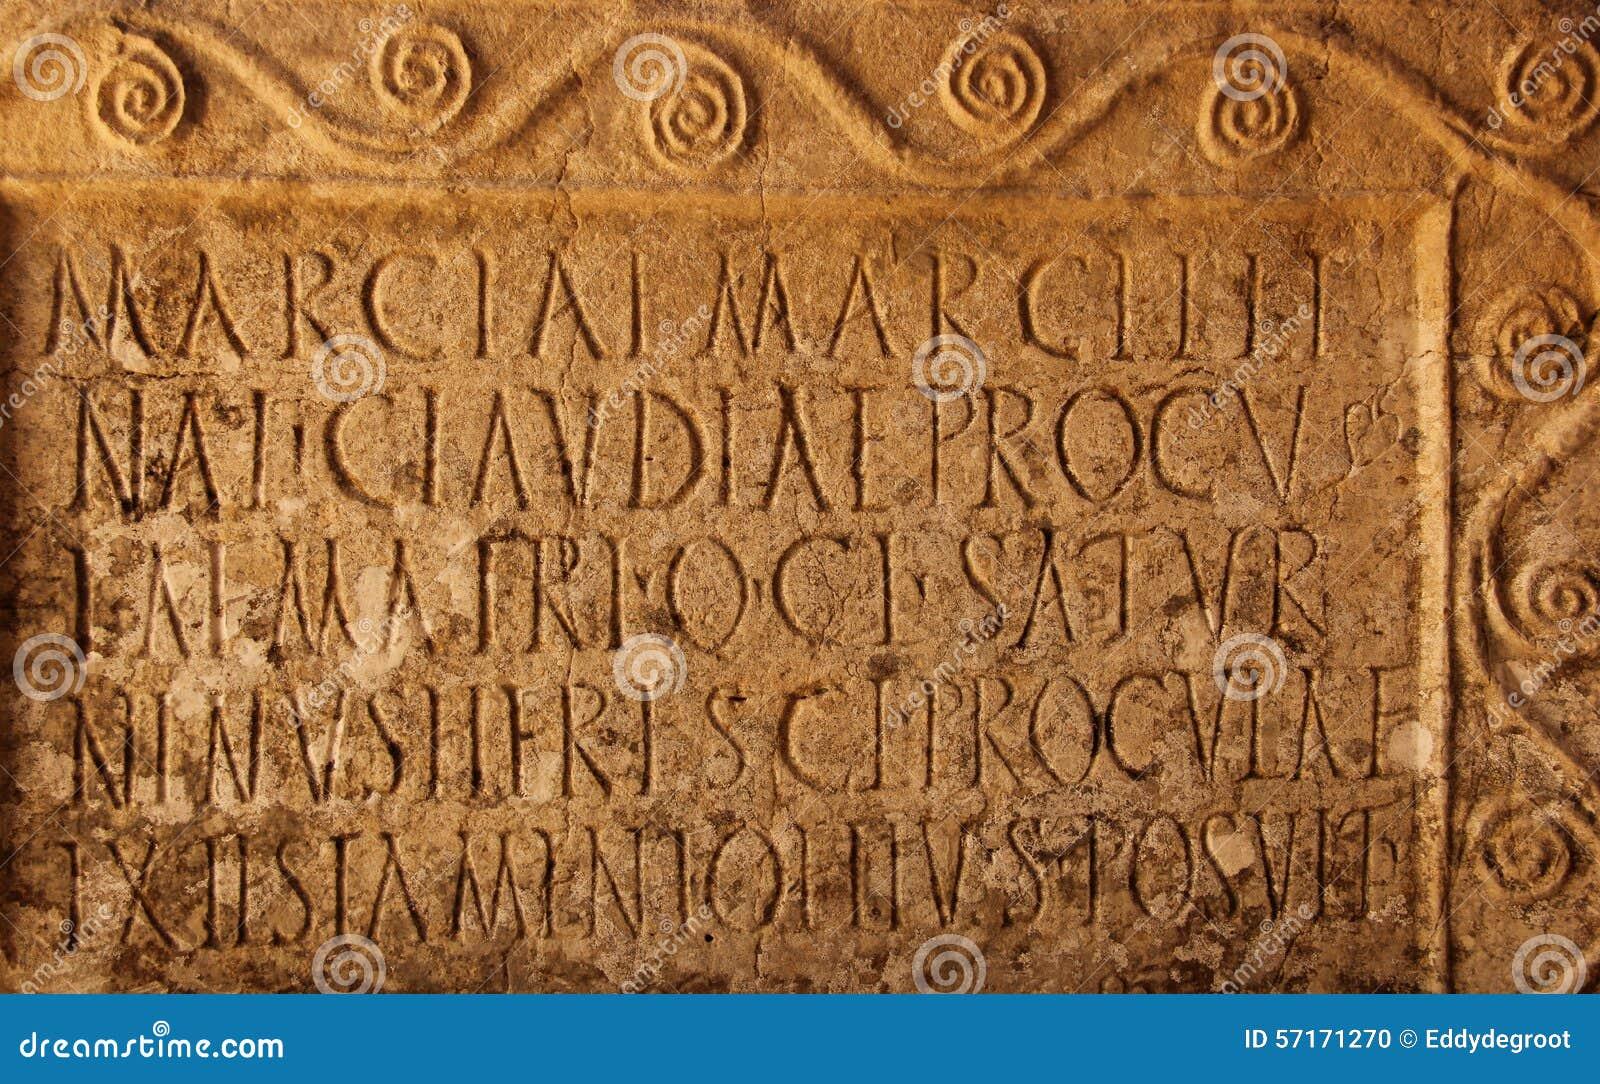 old time roman writing art